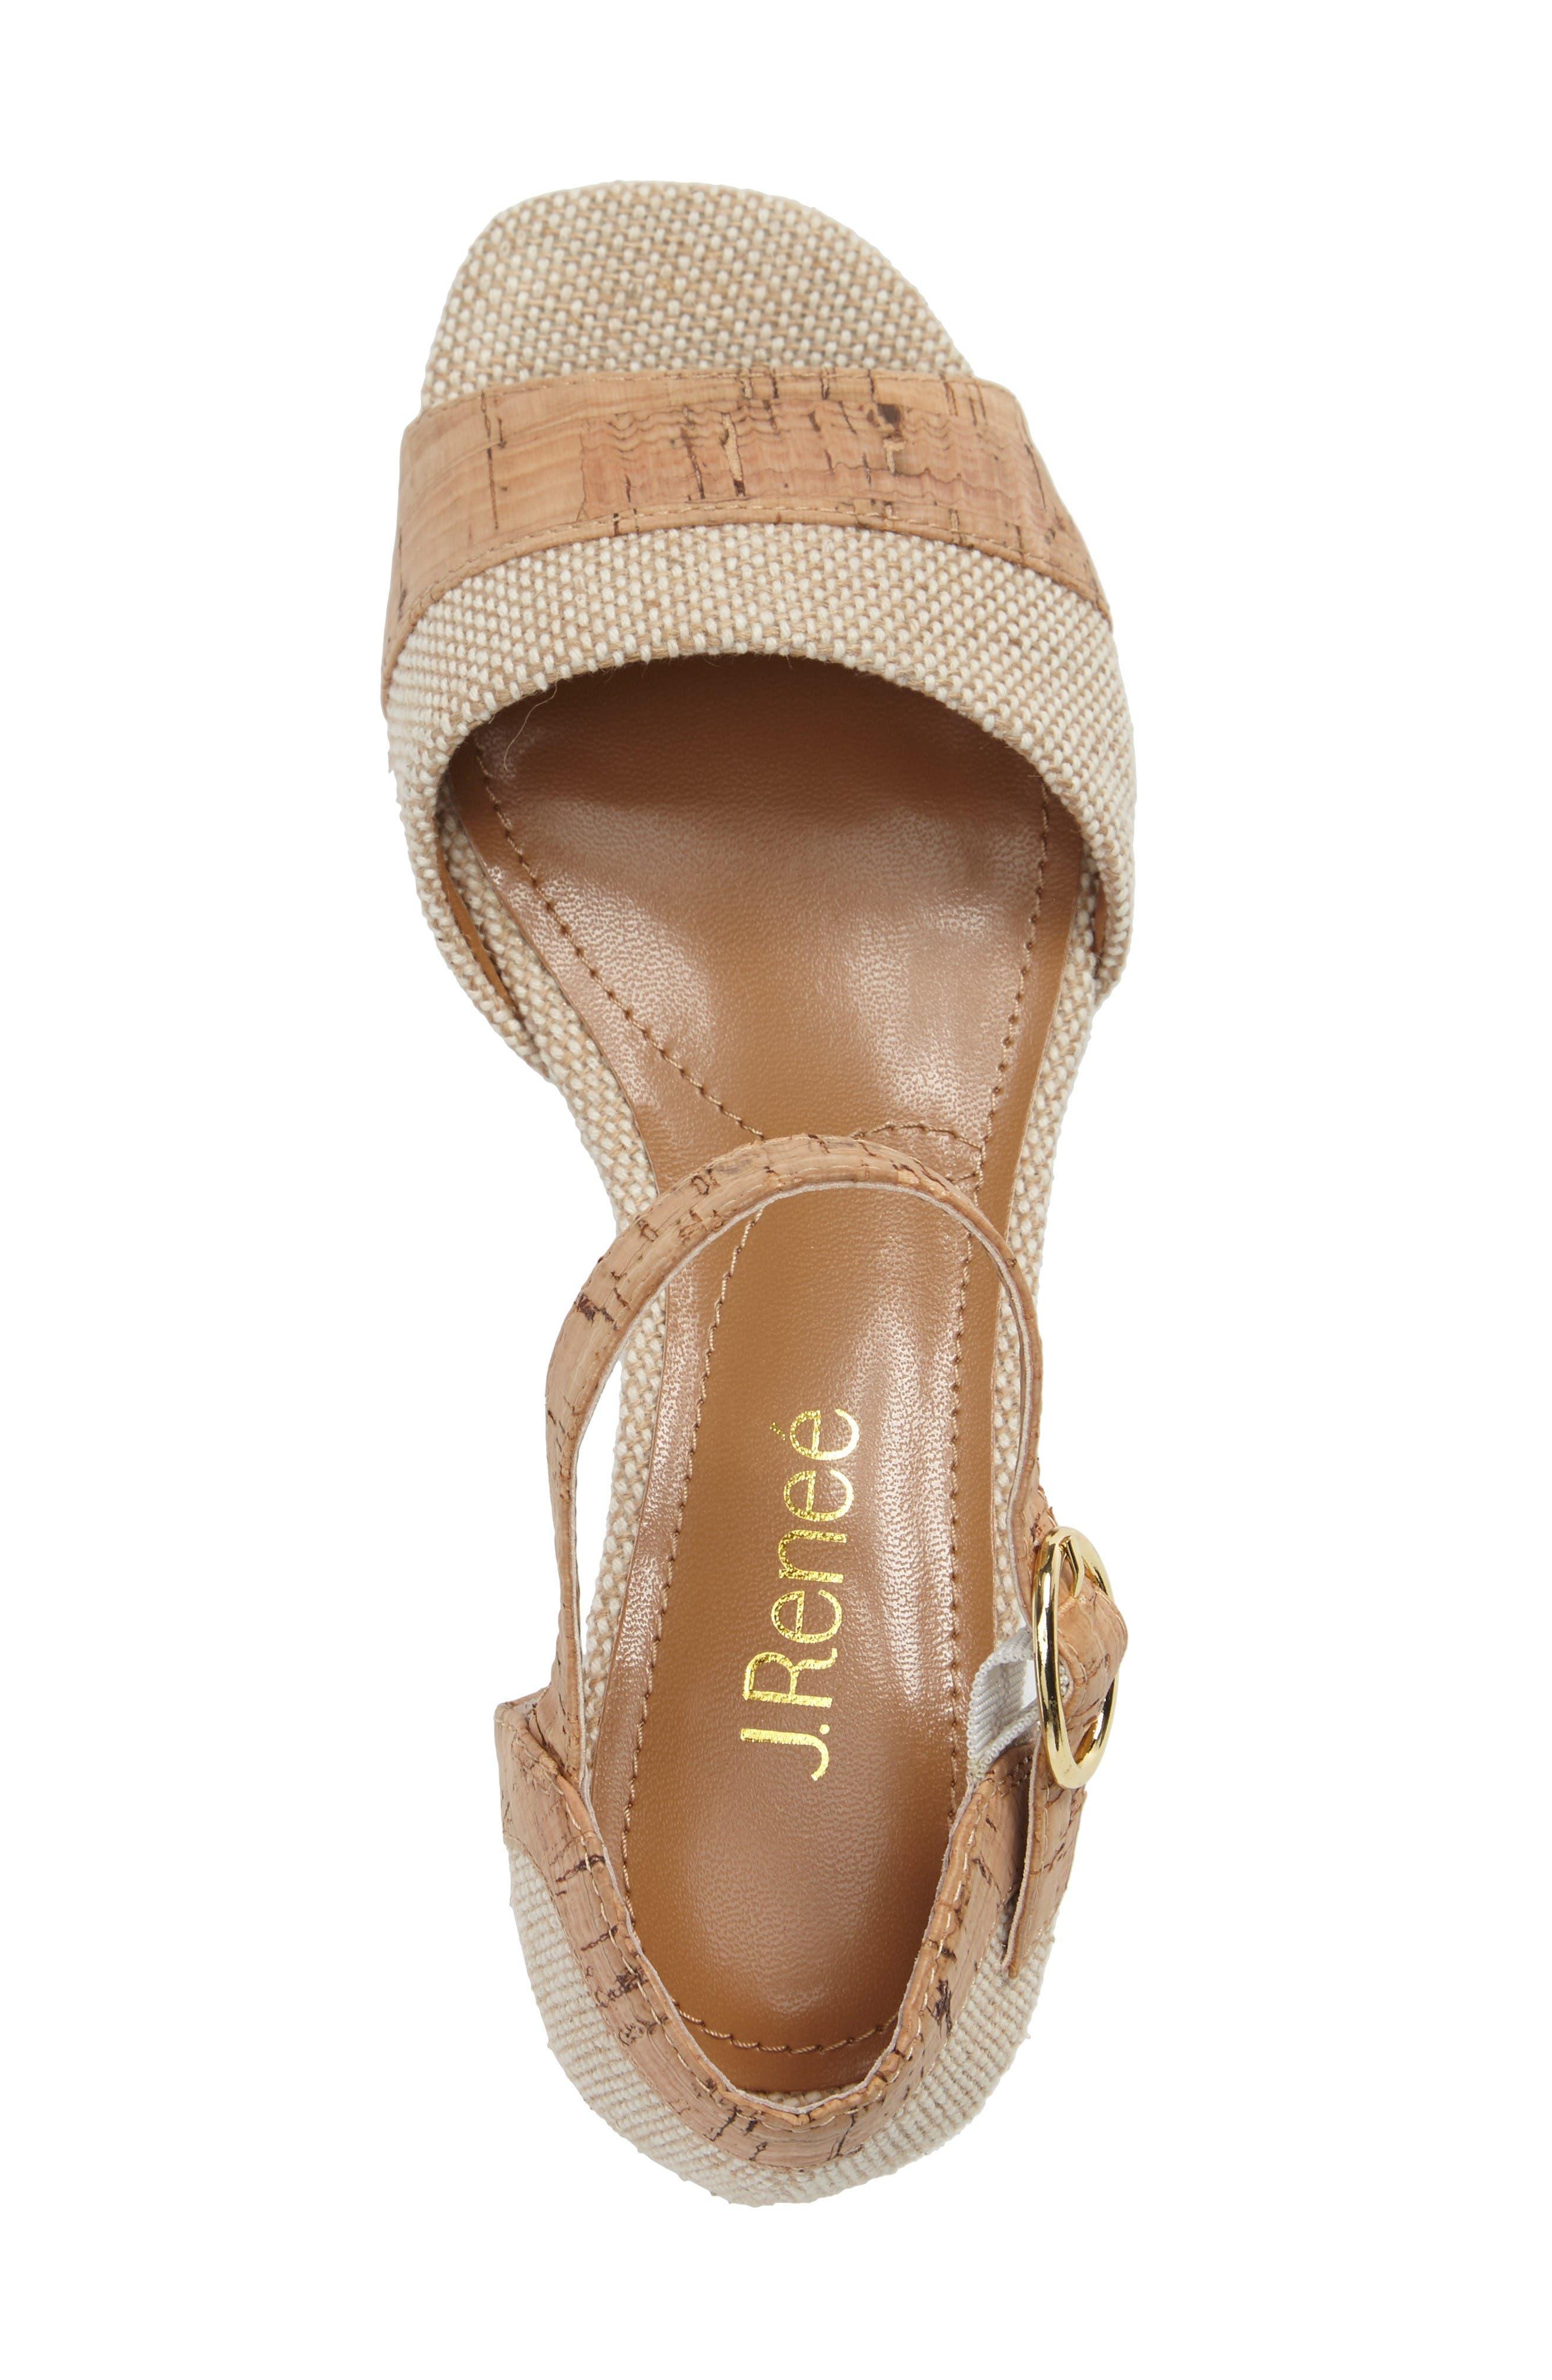 Pebblebeach Block Heel Sandal,                             Alternate thumbnail 3, color,                             Natural/ Cork Fabric